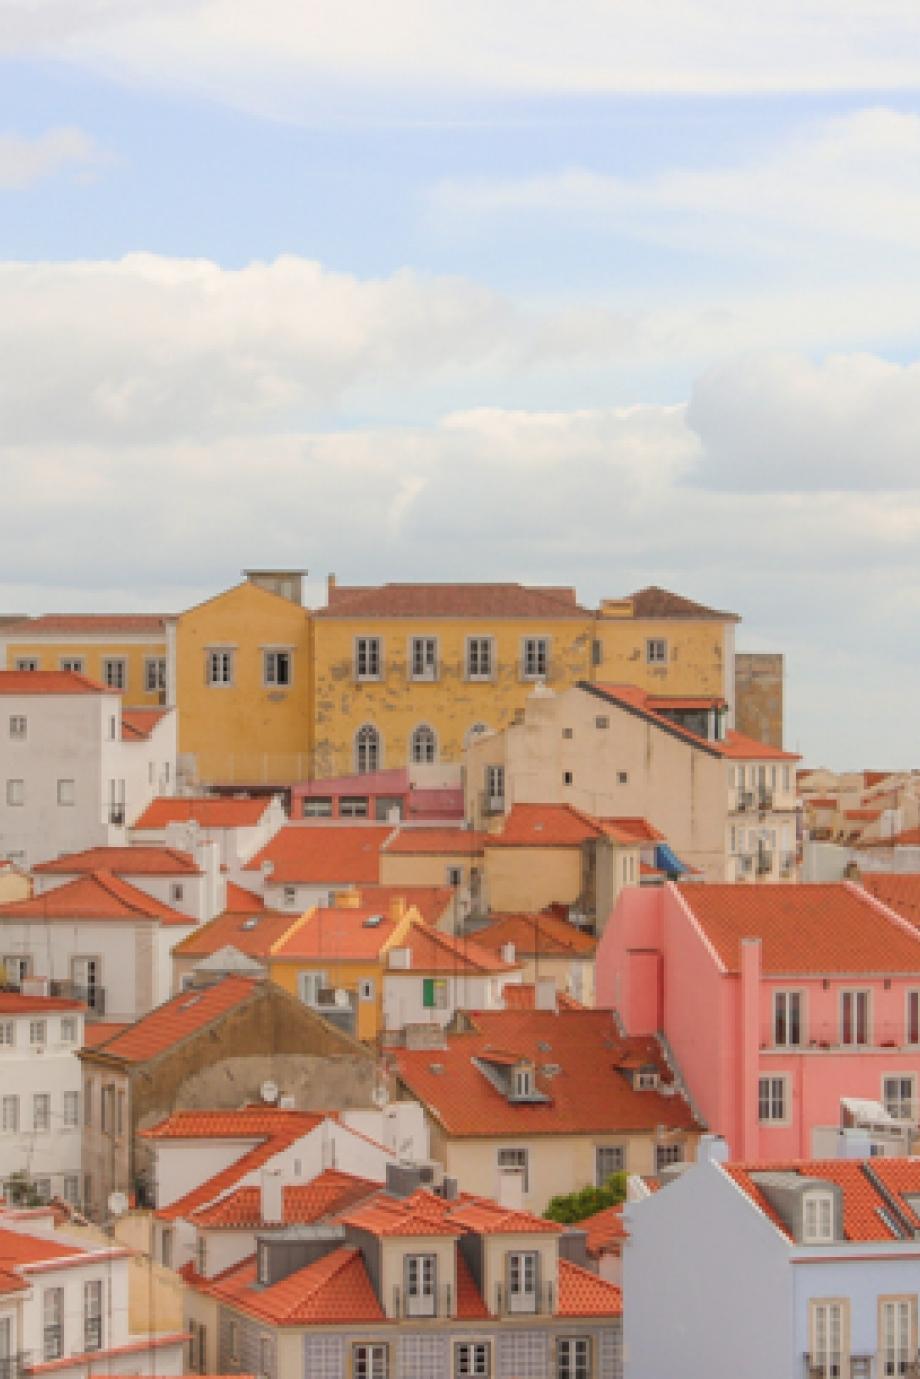 LisboaCool_Visitar_Mirador Portas do Sol